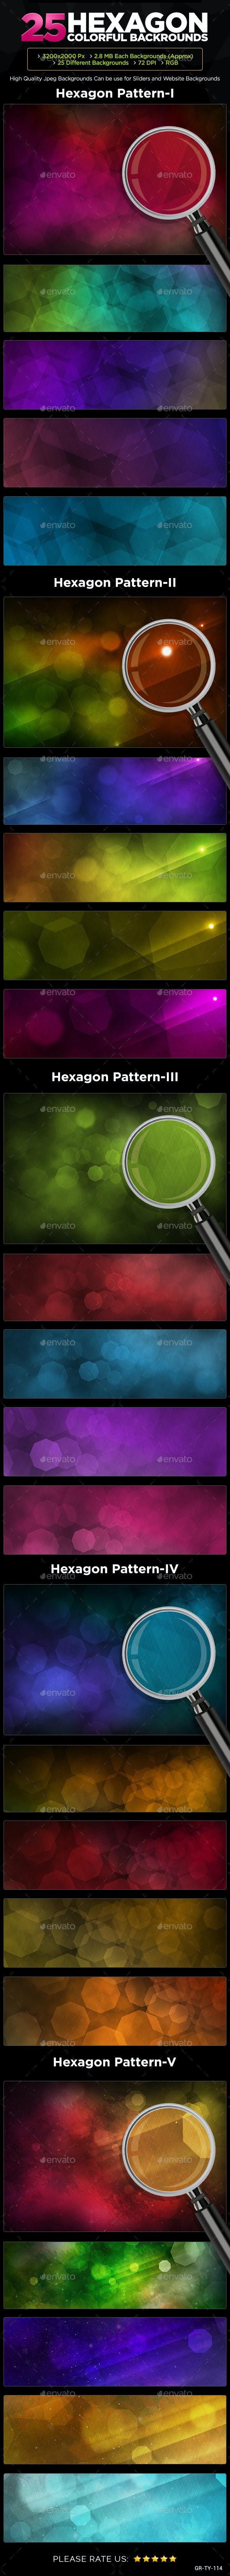 25 Hexagon Backgrounds - Backgrounds Graphics